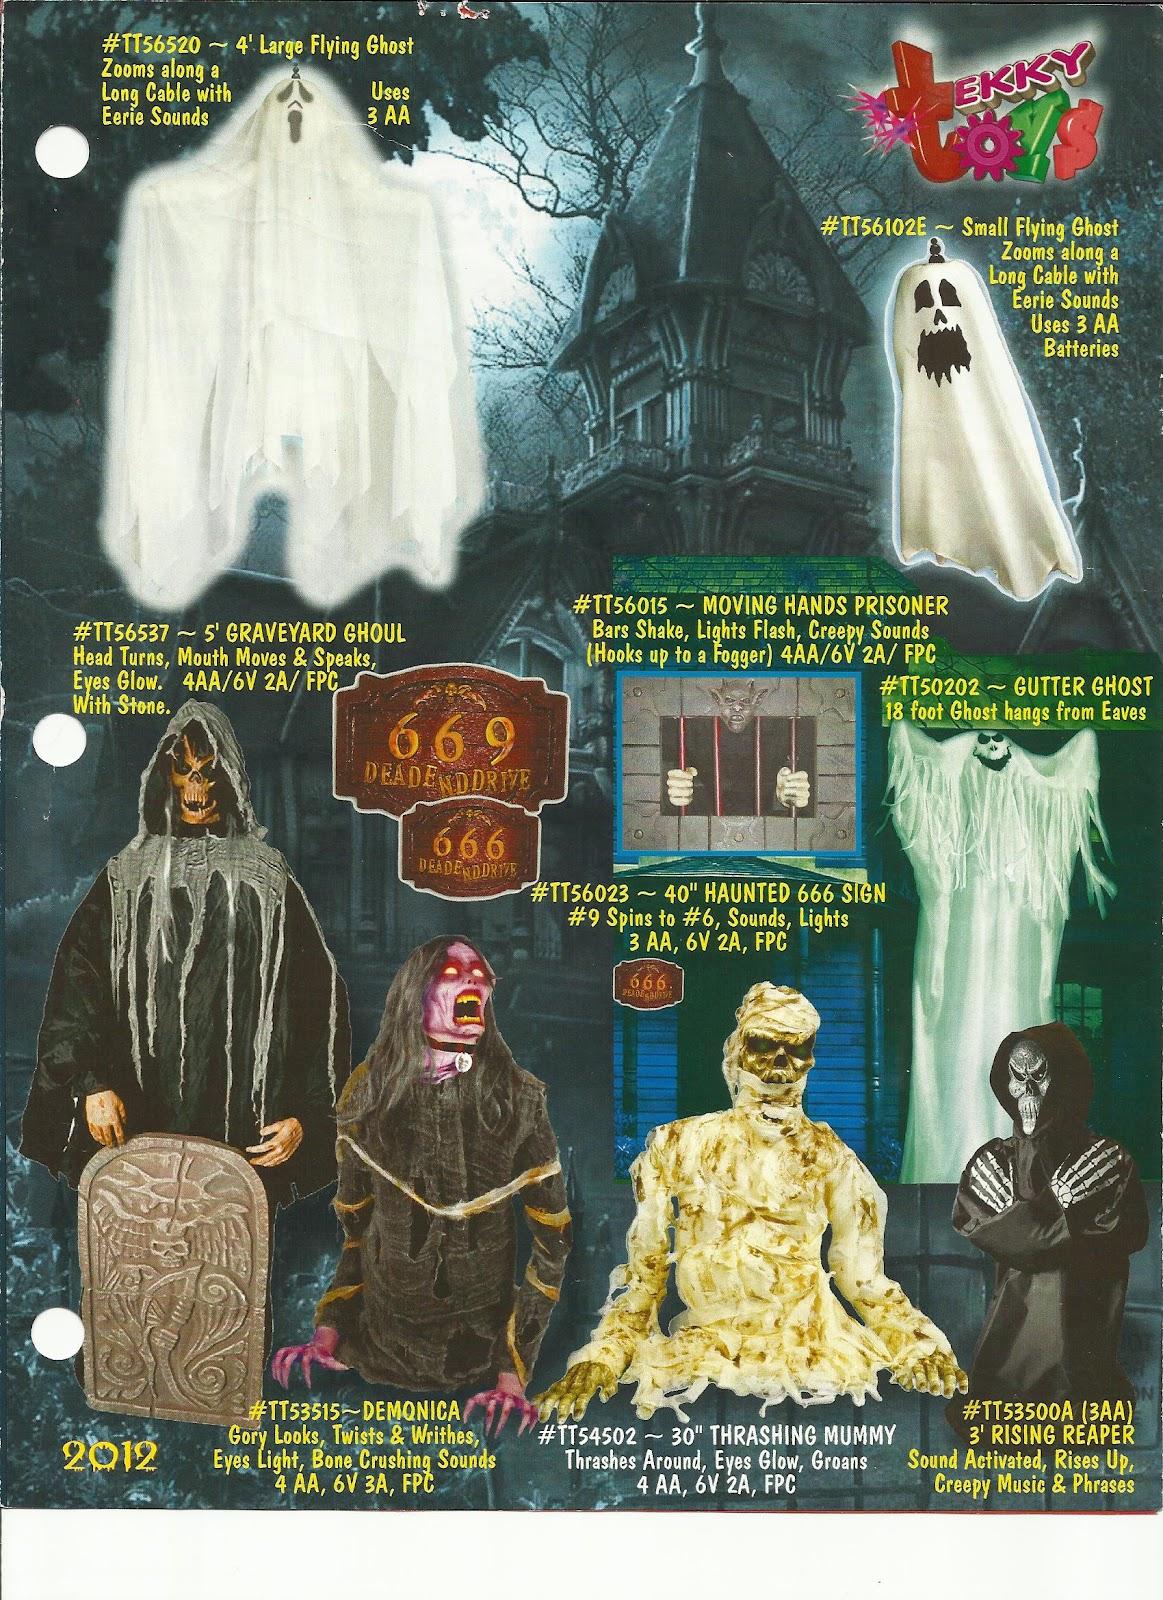 tekky toys halloween catalog 2012 - Halloween Catalog